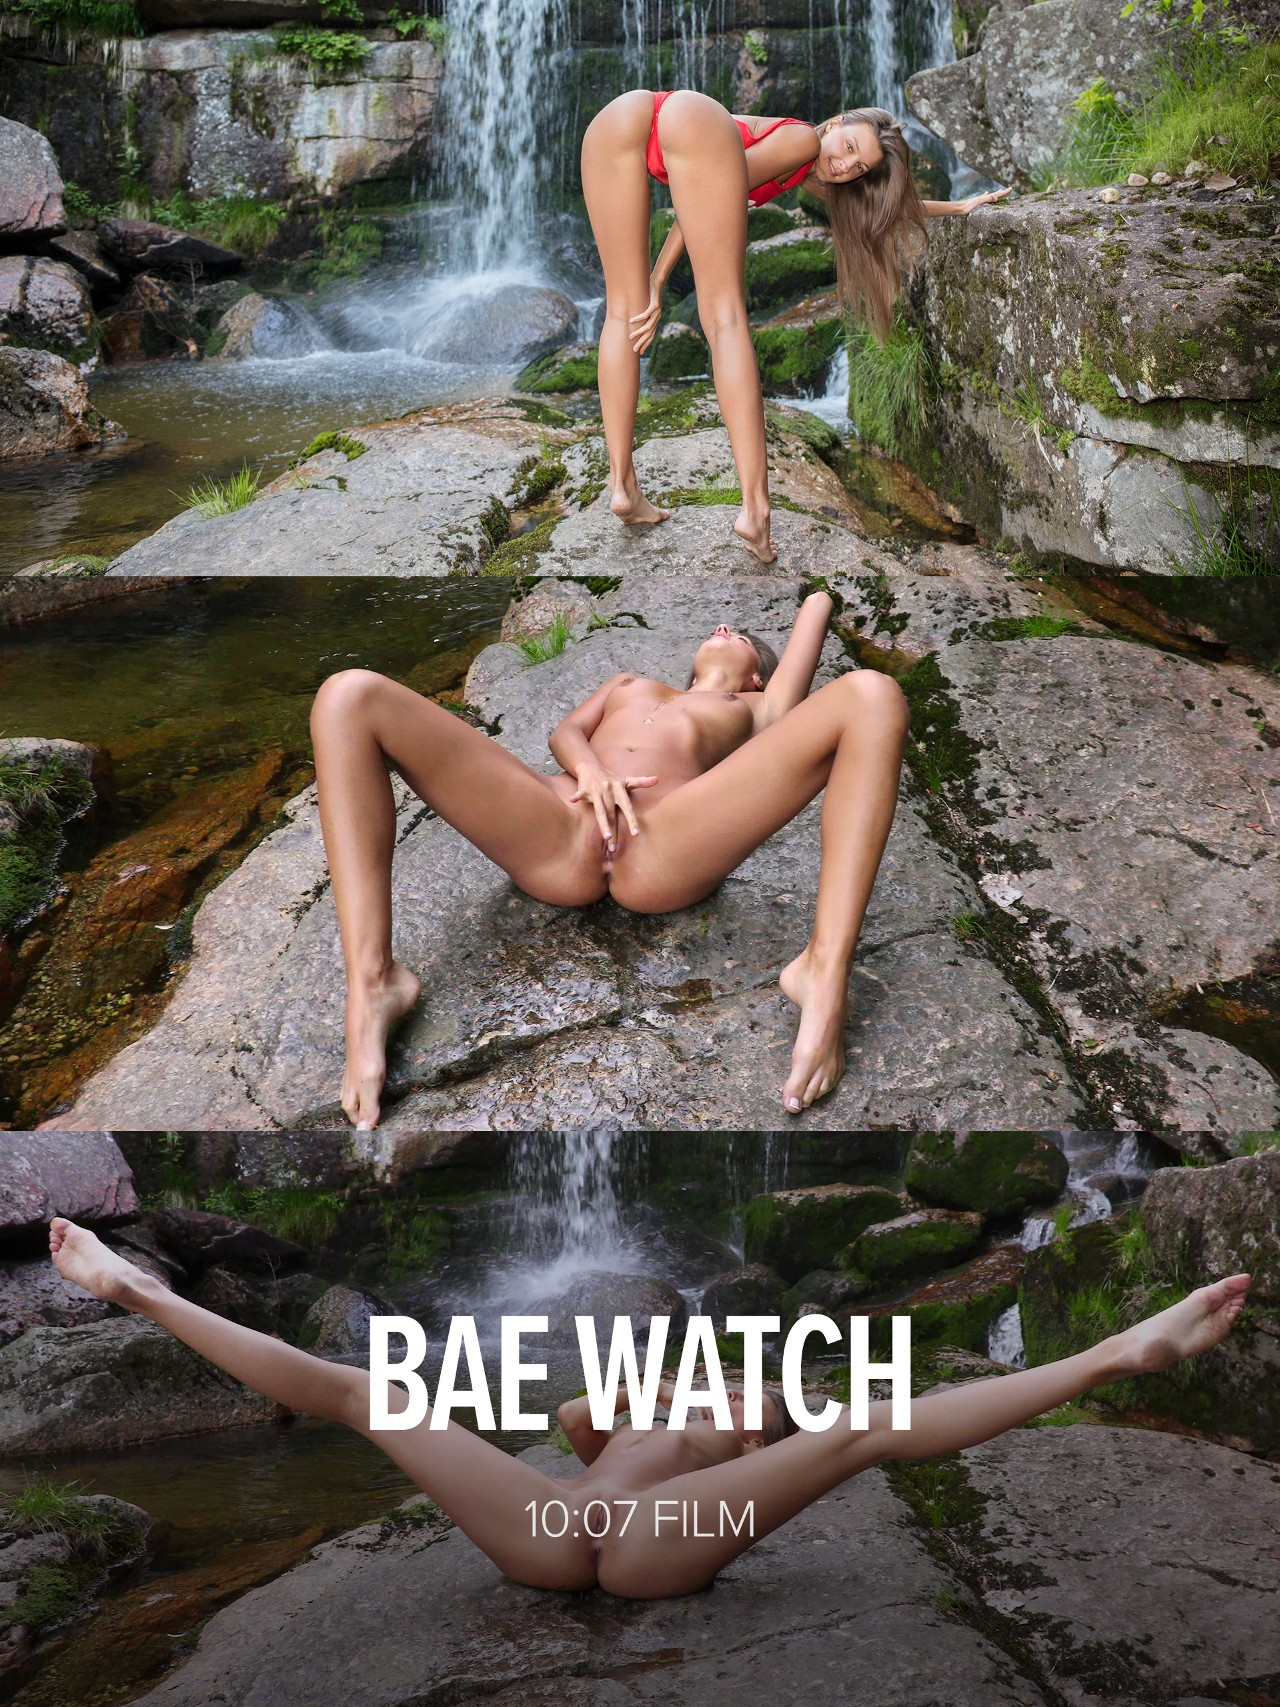 Maria: Bae Watch